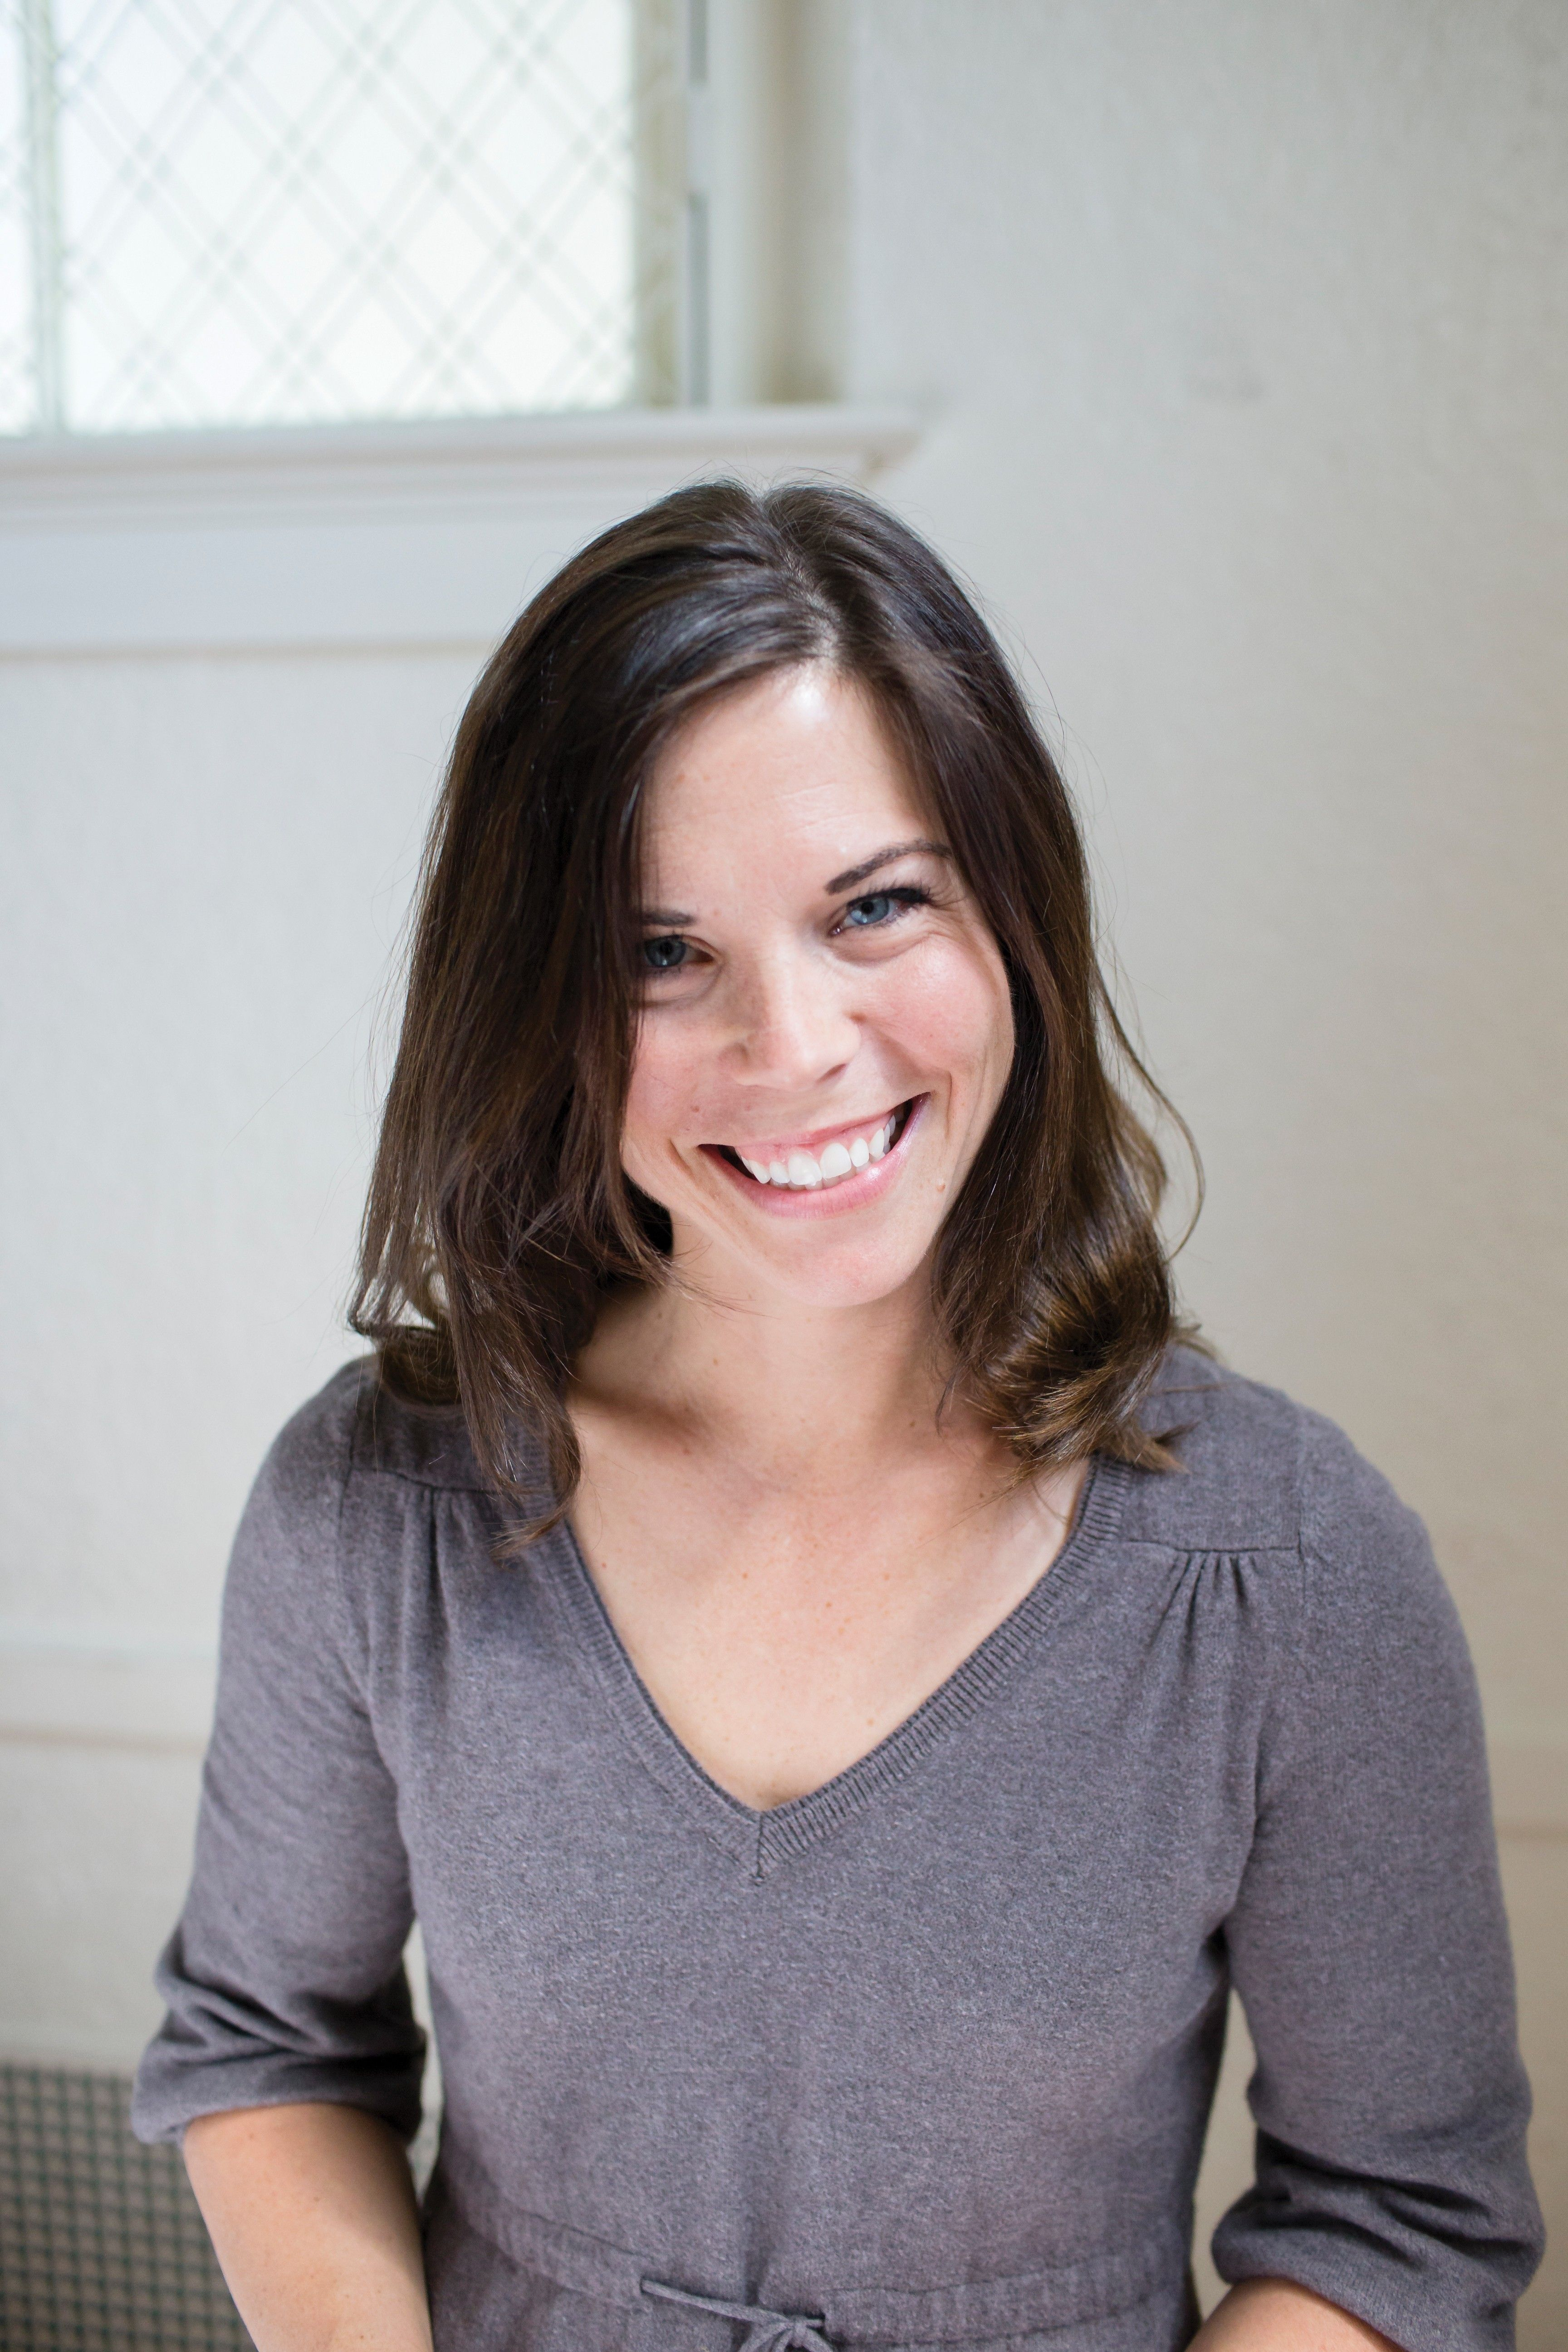 A portrait of a woman smiling.